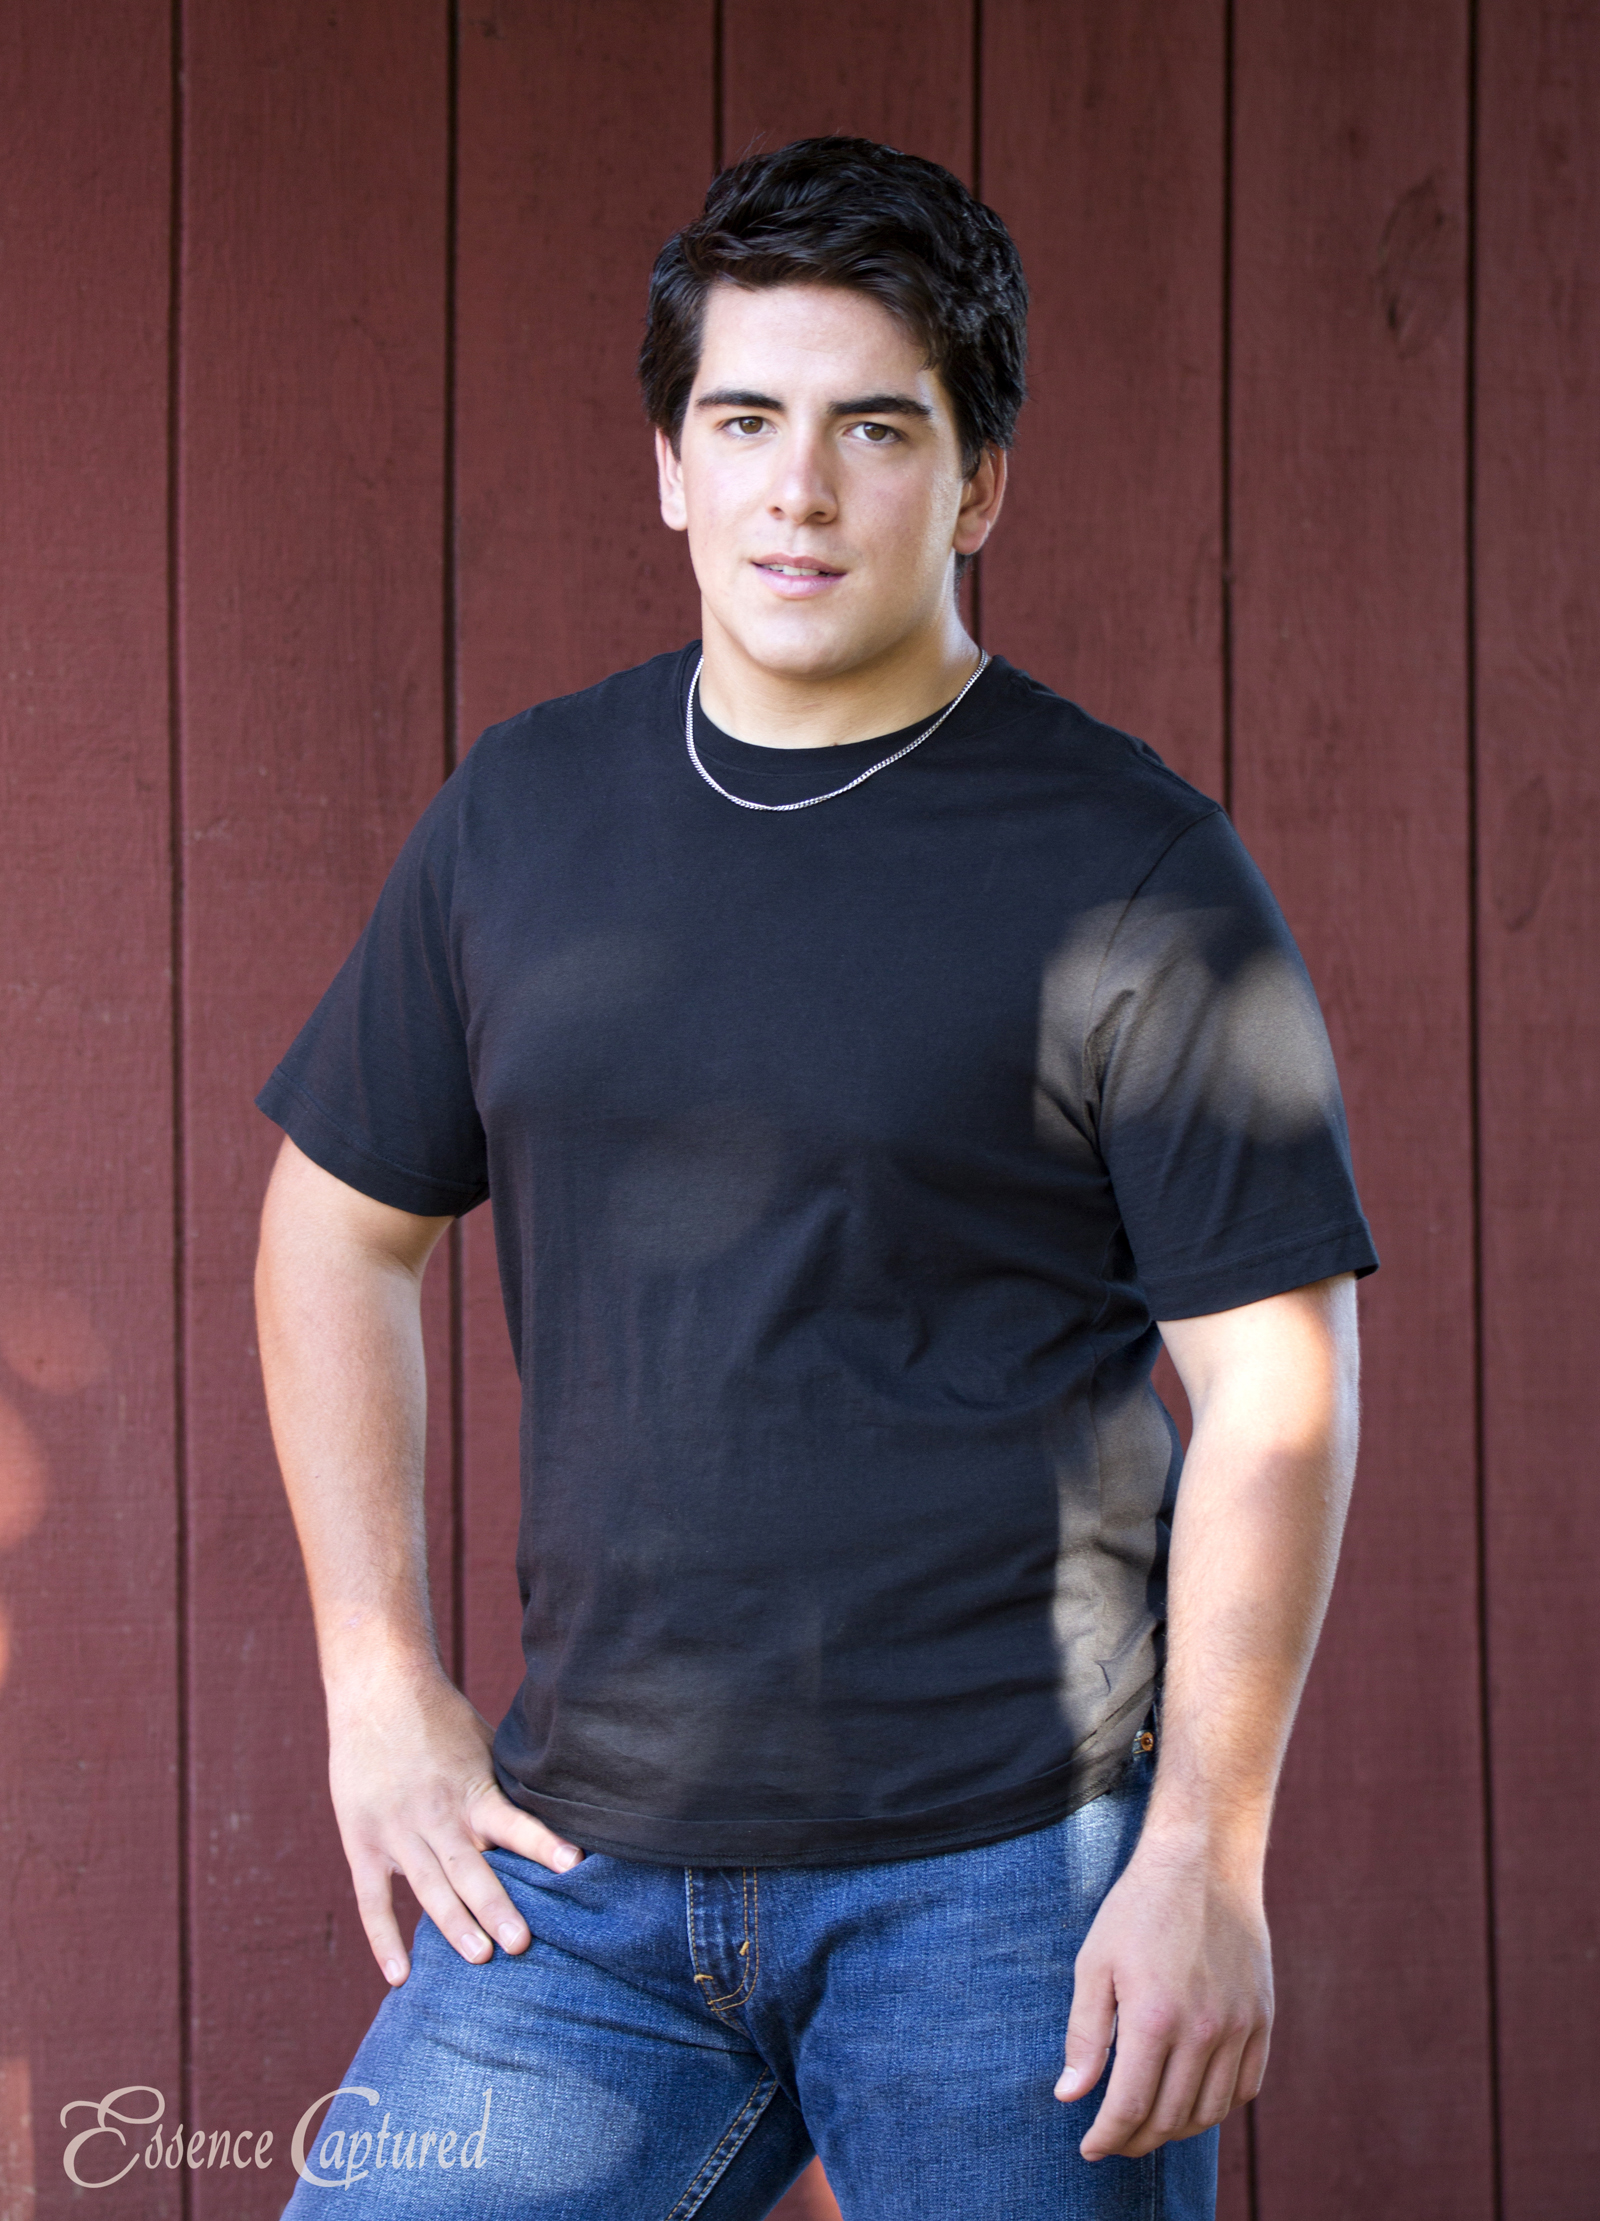 male in black t-shirt